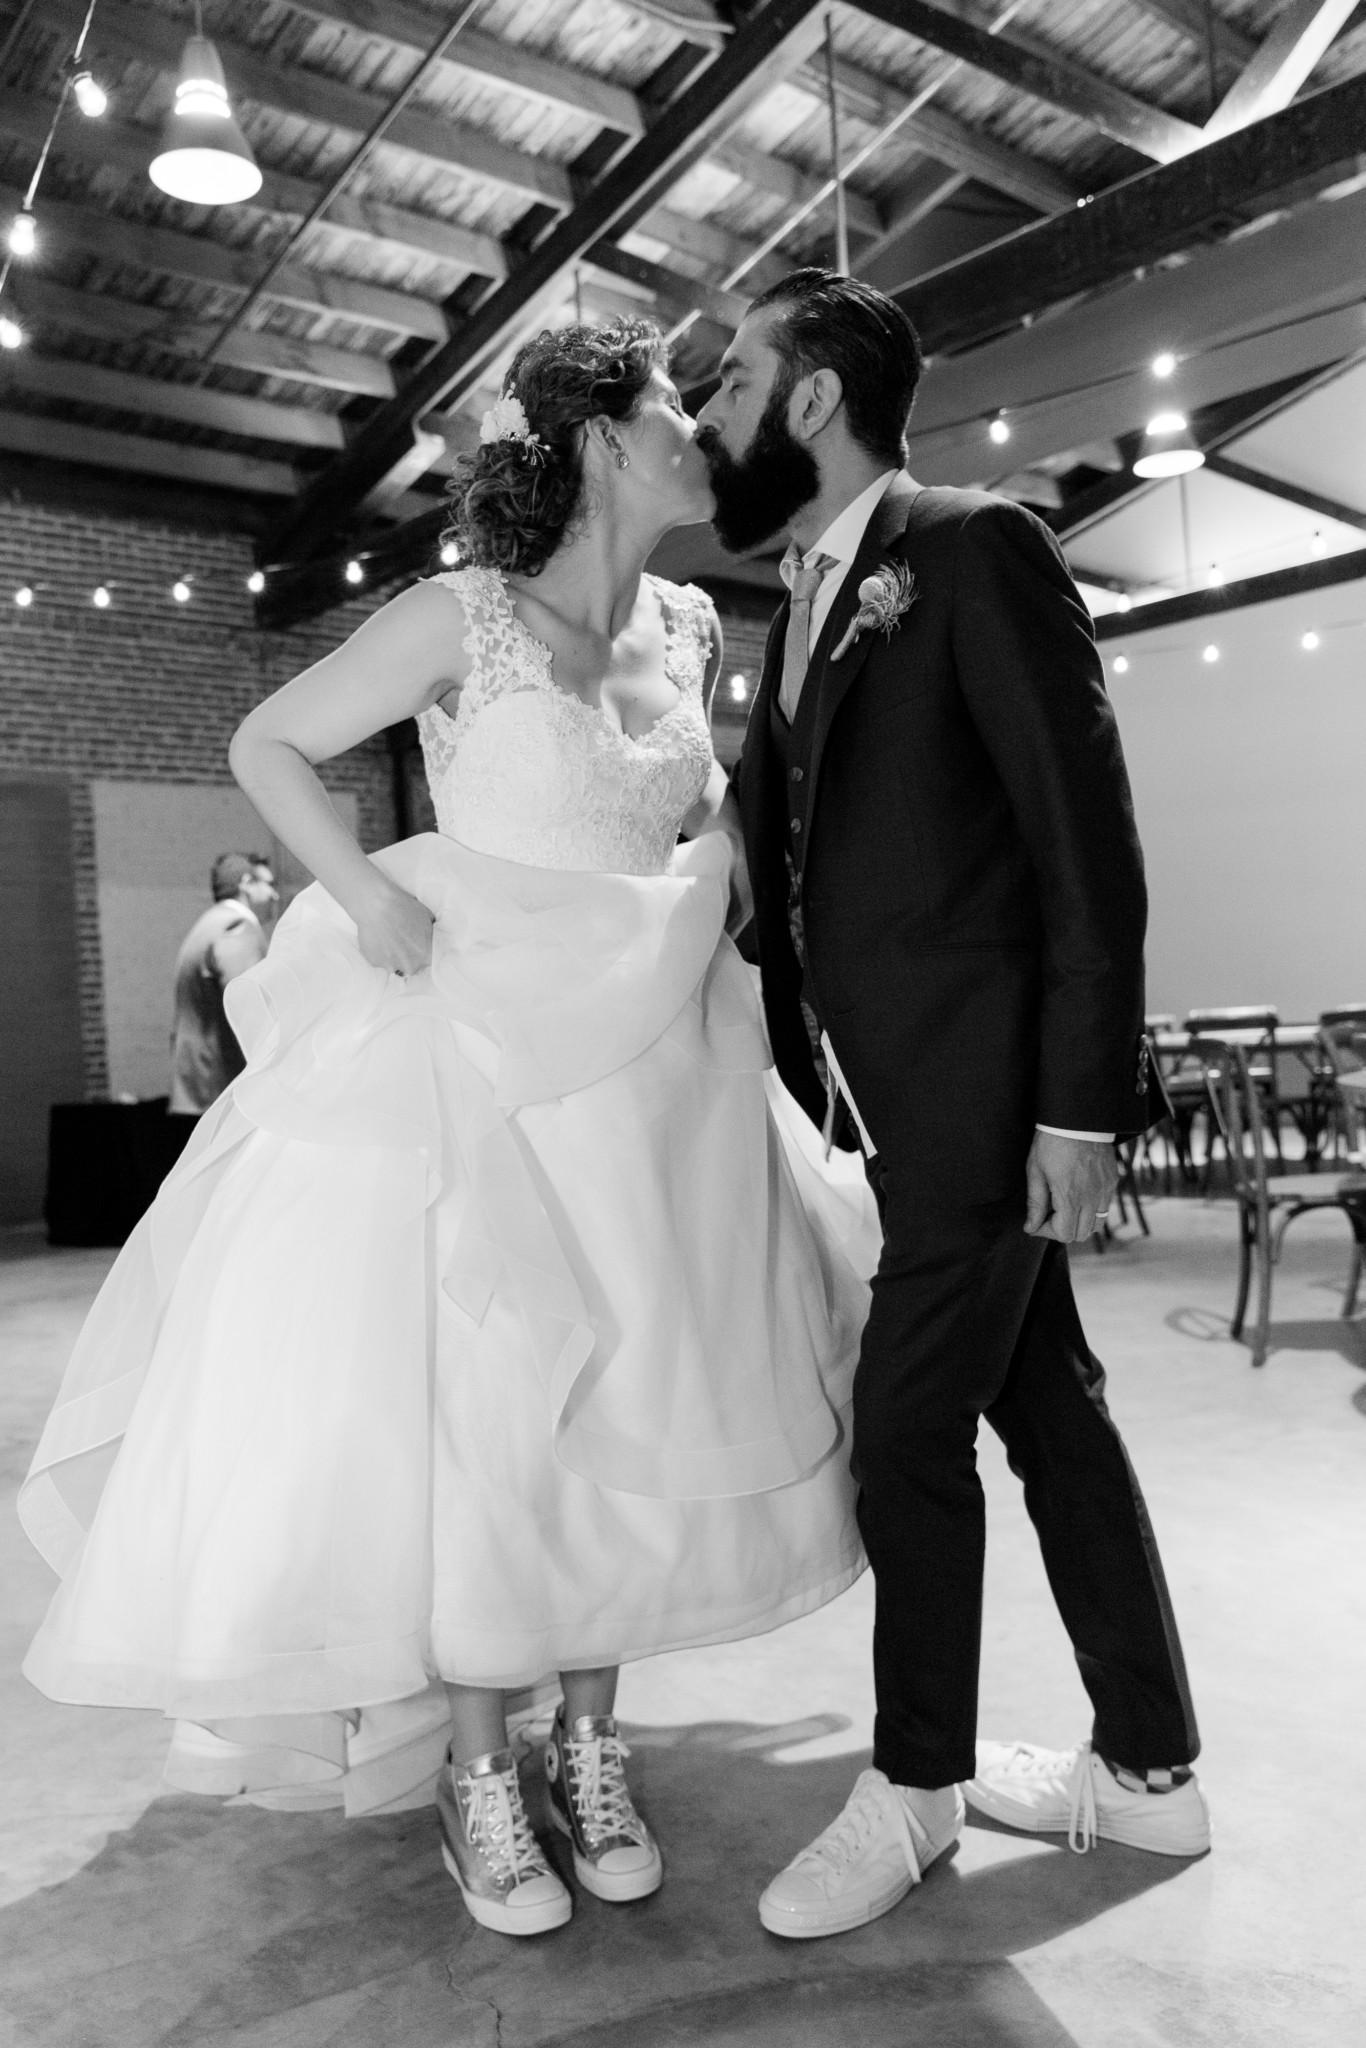 Kristen-Greg-Wedding-1390-683x1024@2x.jpg